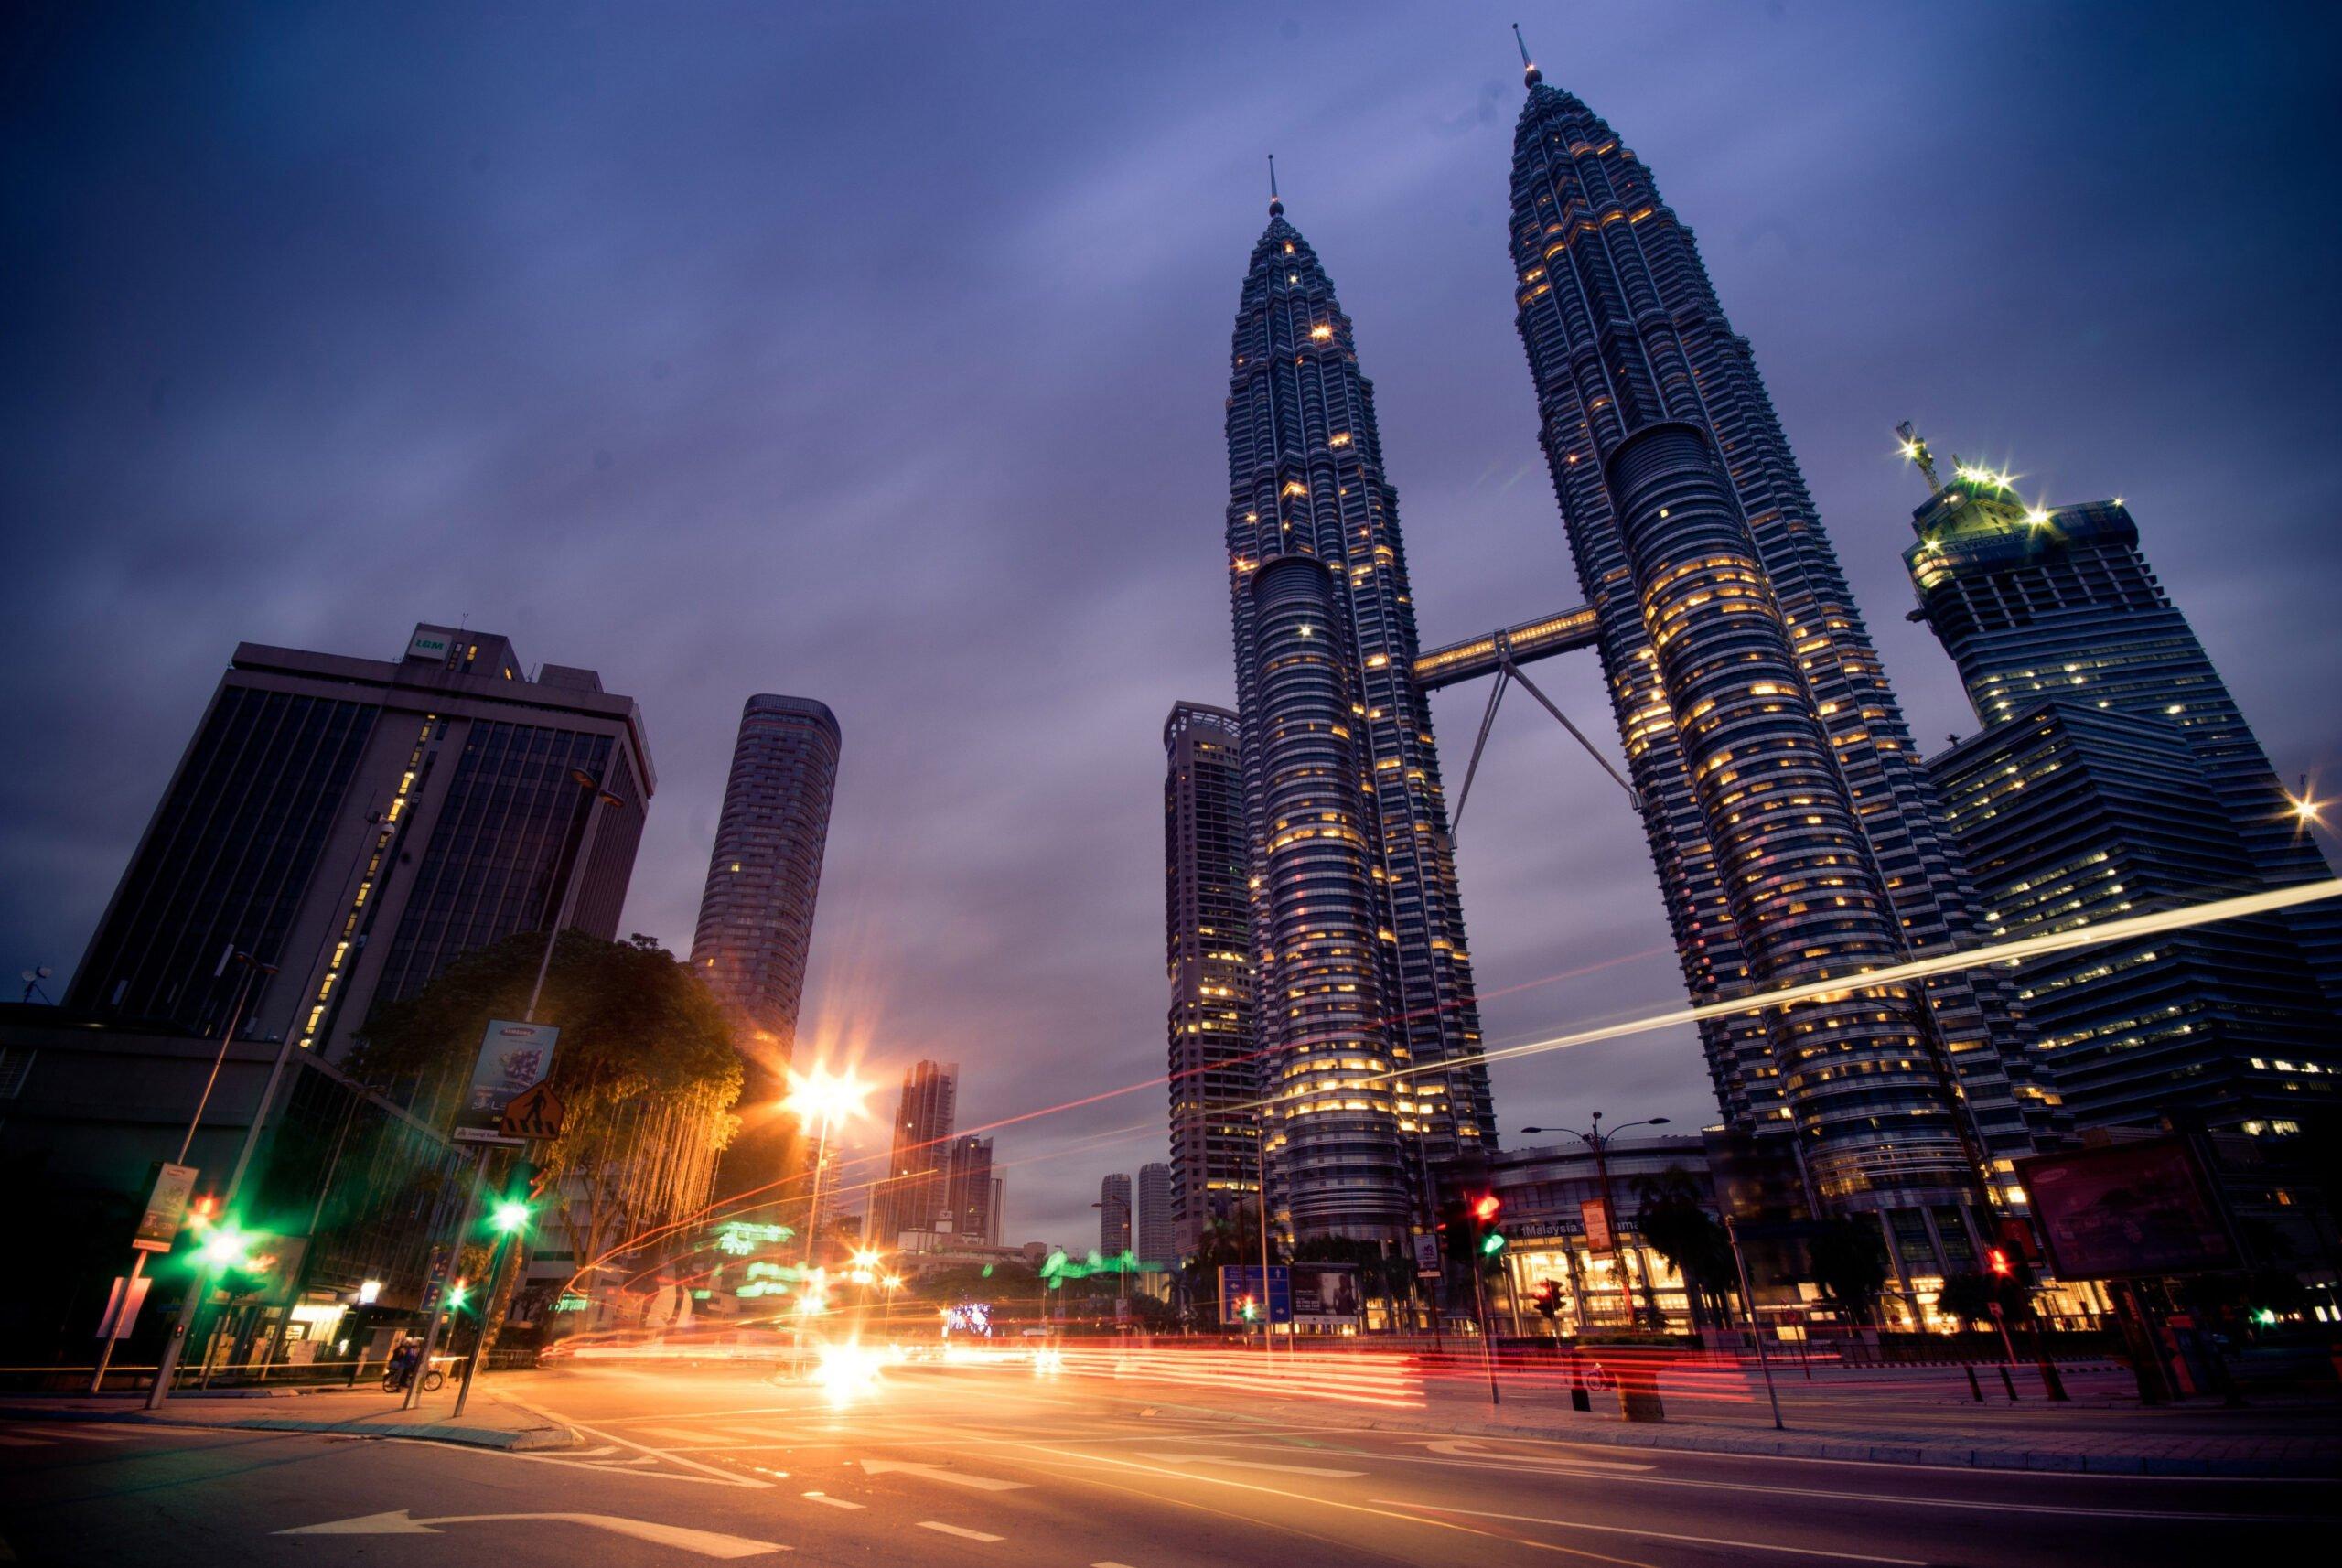 Kuala Lumpur Petronas Towers - CC0 / Public Domain - Things to do in Kuala Lumpur